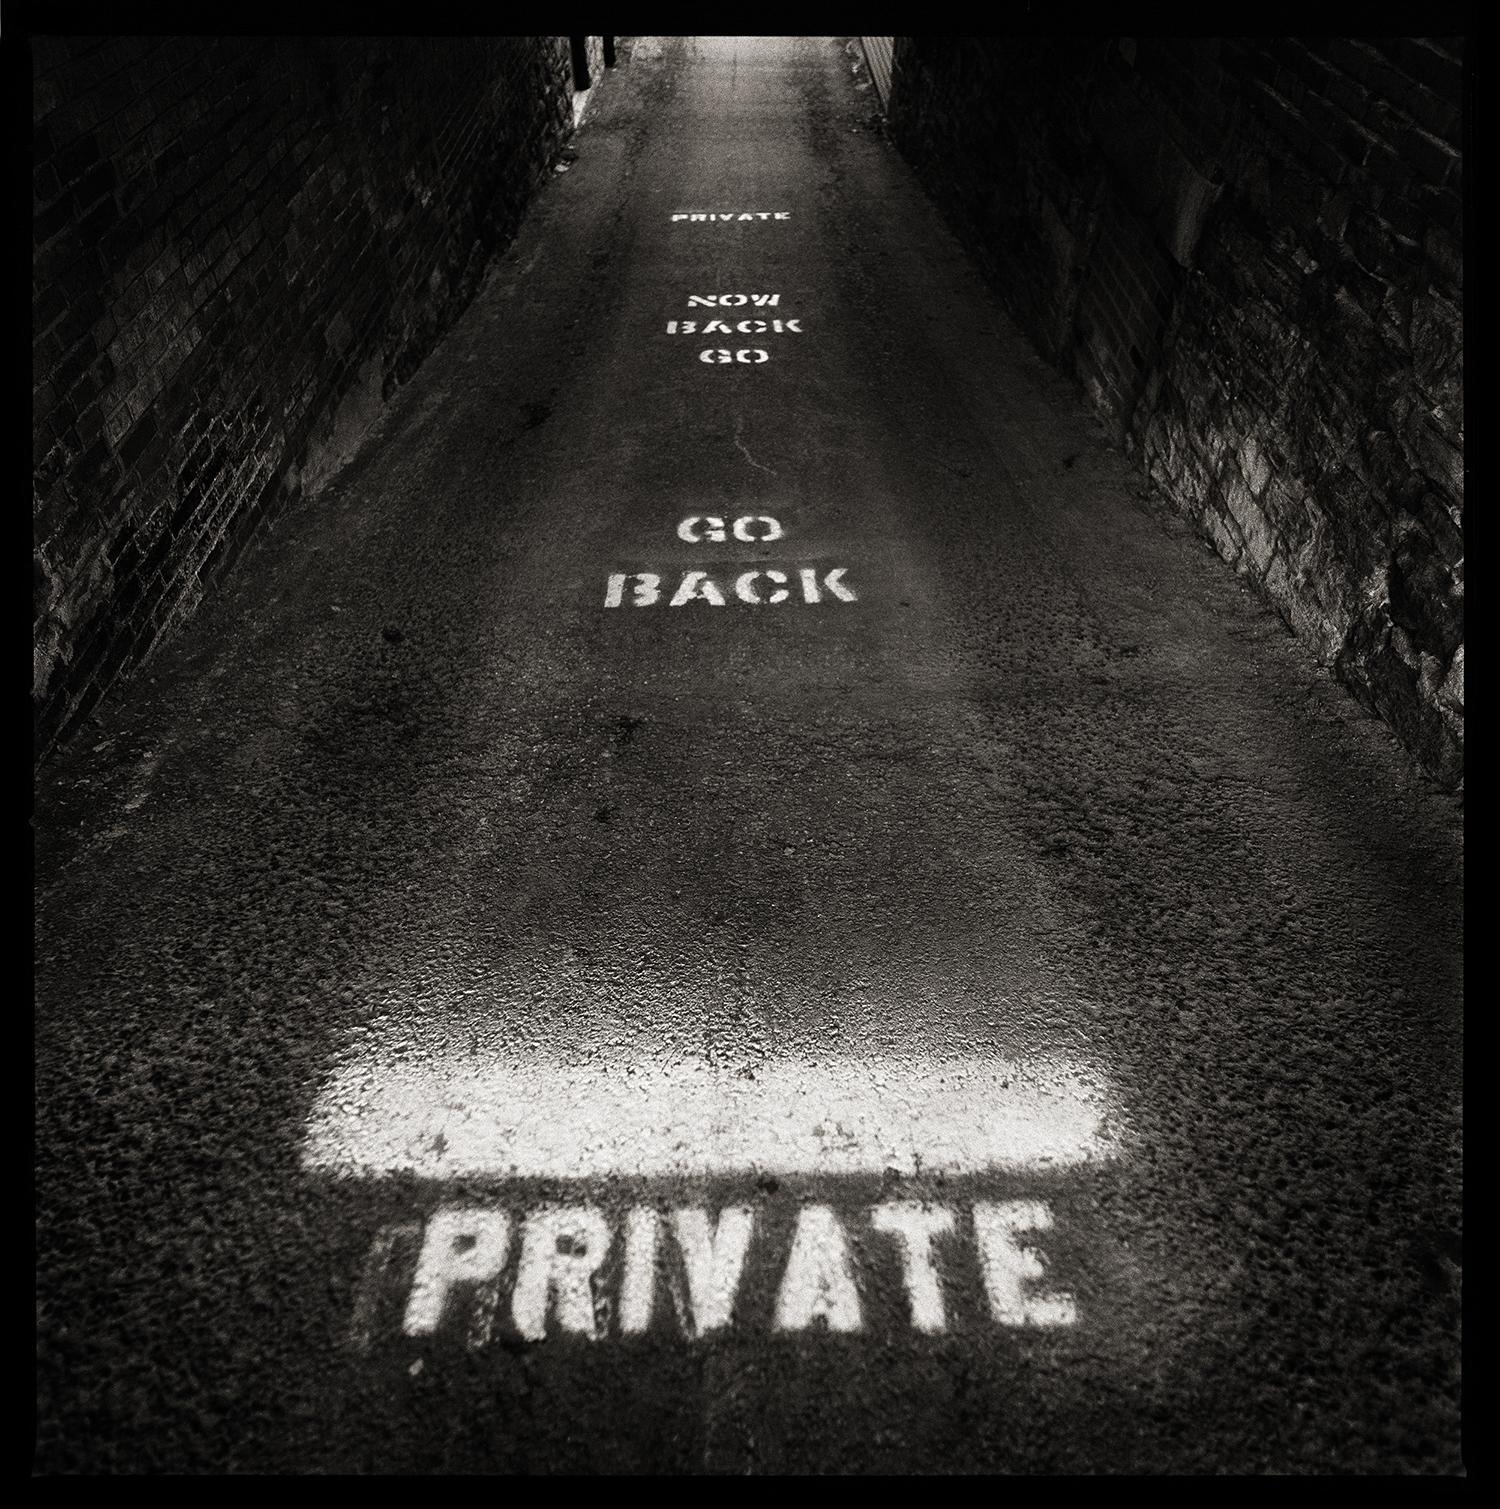 PRIVATE | Now Back Go : Go Back | PRIVATE